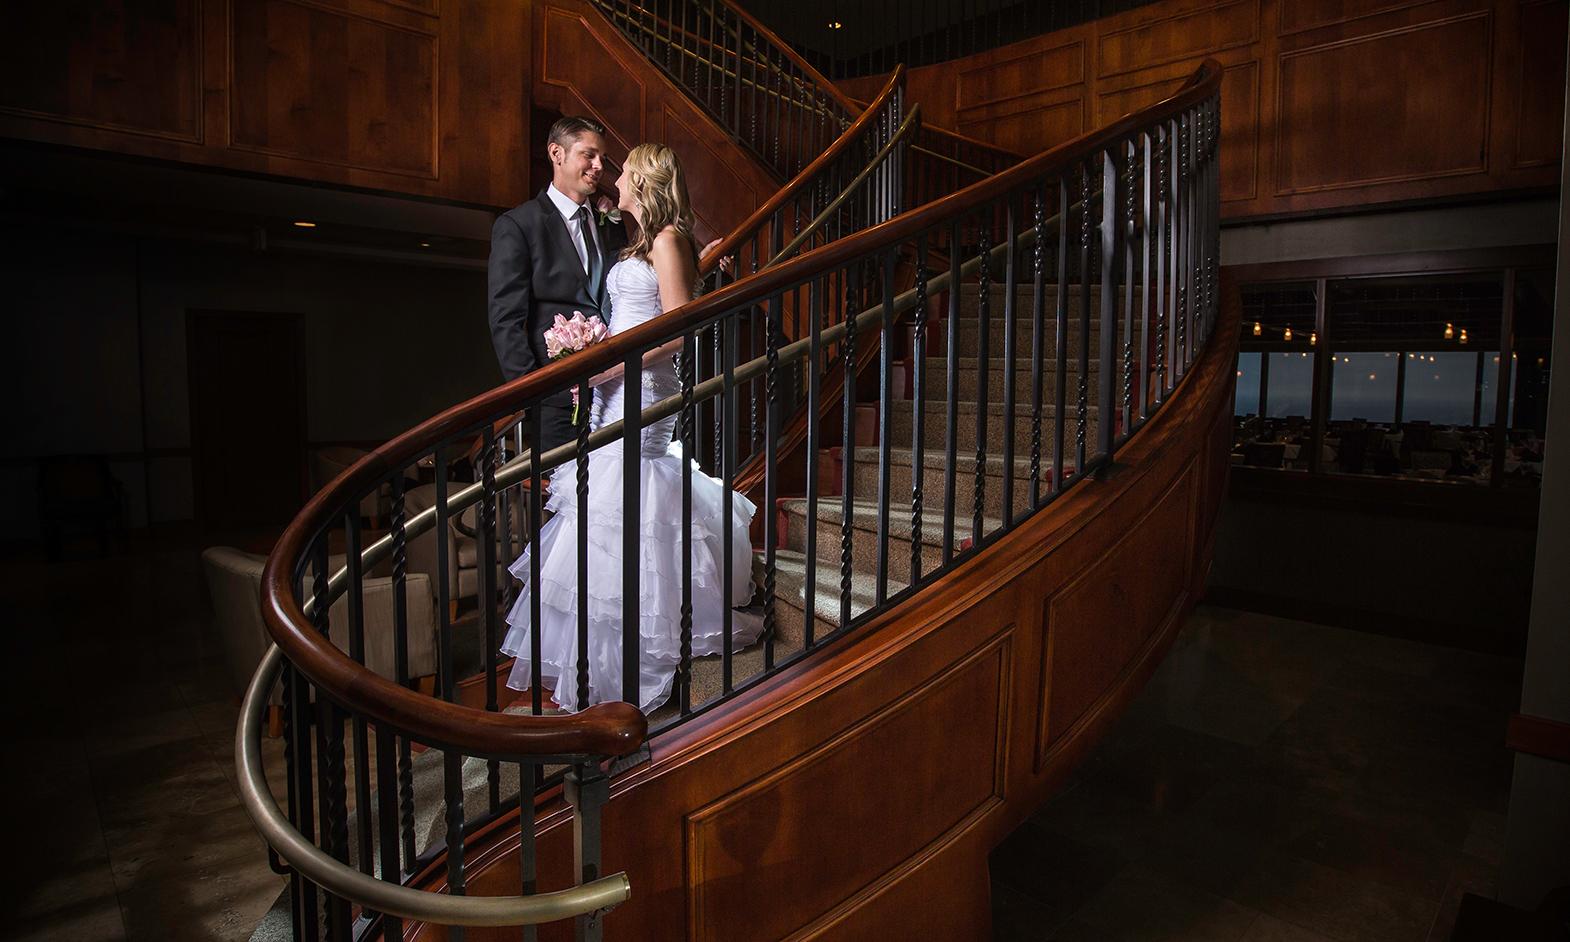 adam-szarmack-wedding-spiral-staircase-bride-groom.jpg